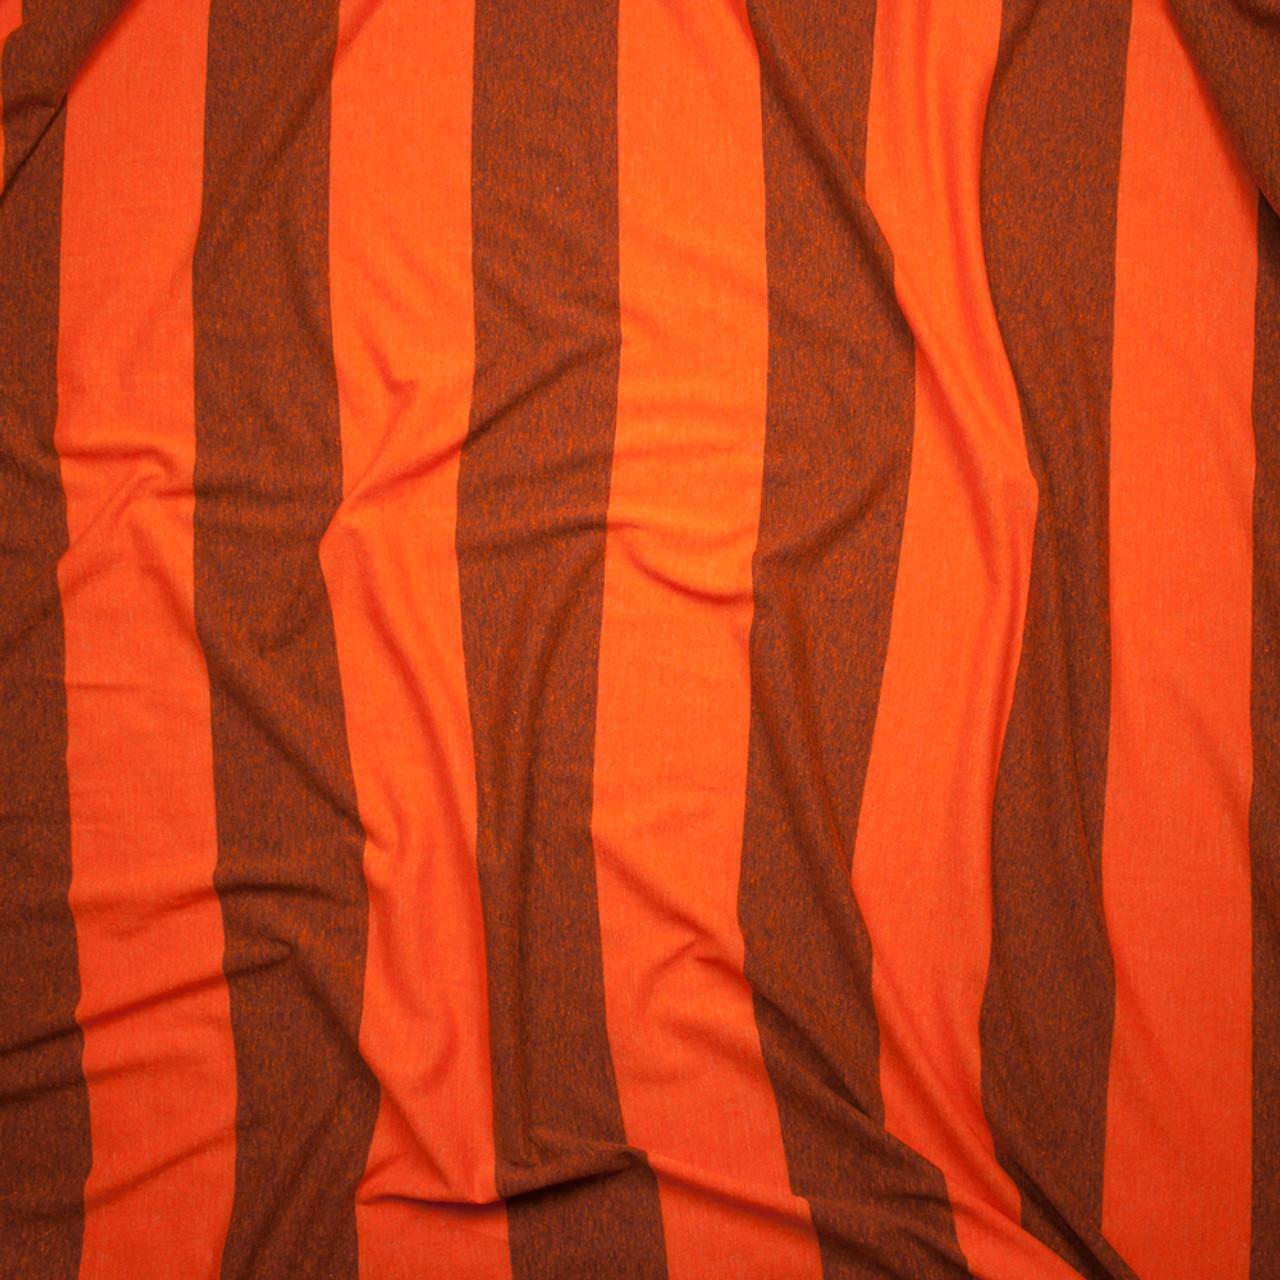 c88922f97f5 ... Orange Wide Stripe Lightweight Jersey Knit Fabric By The Yard - Wide  shot